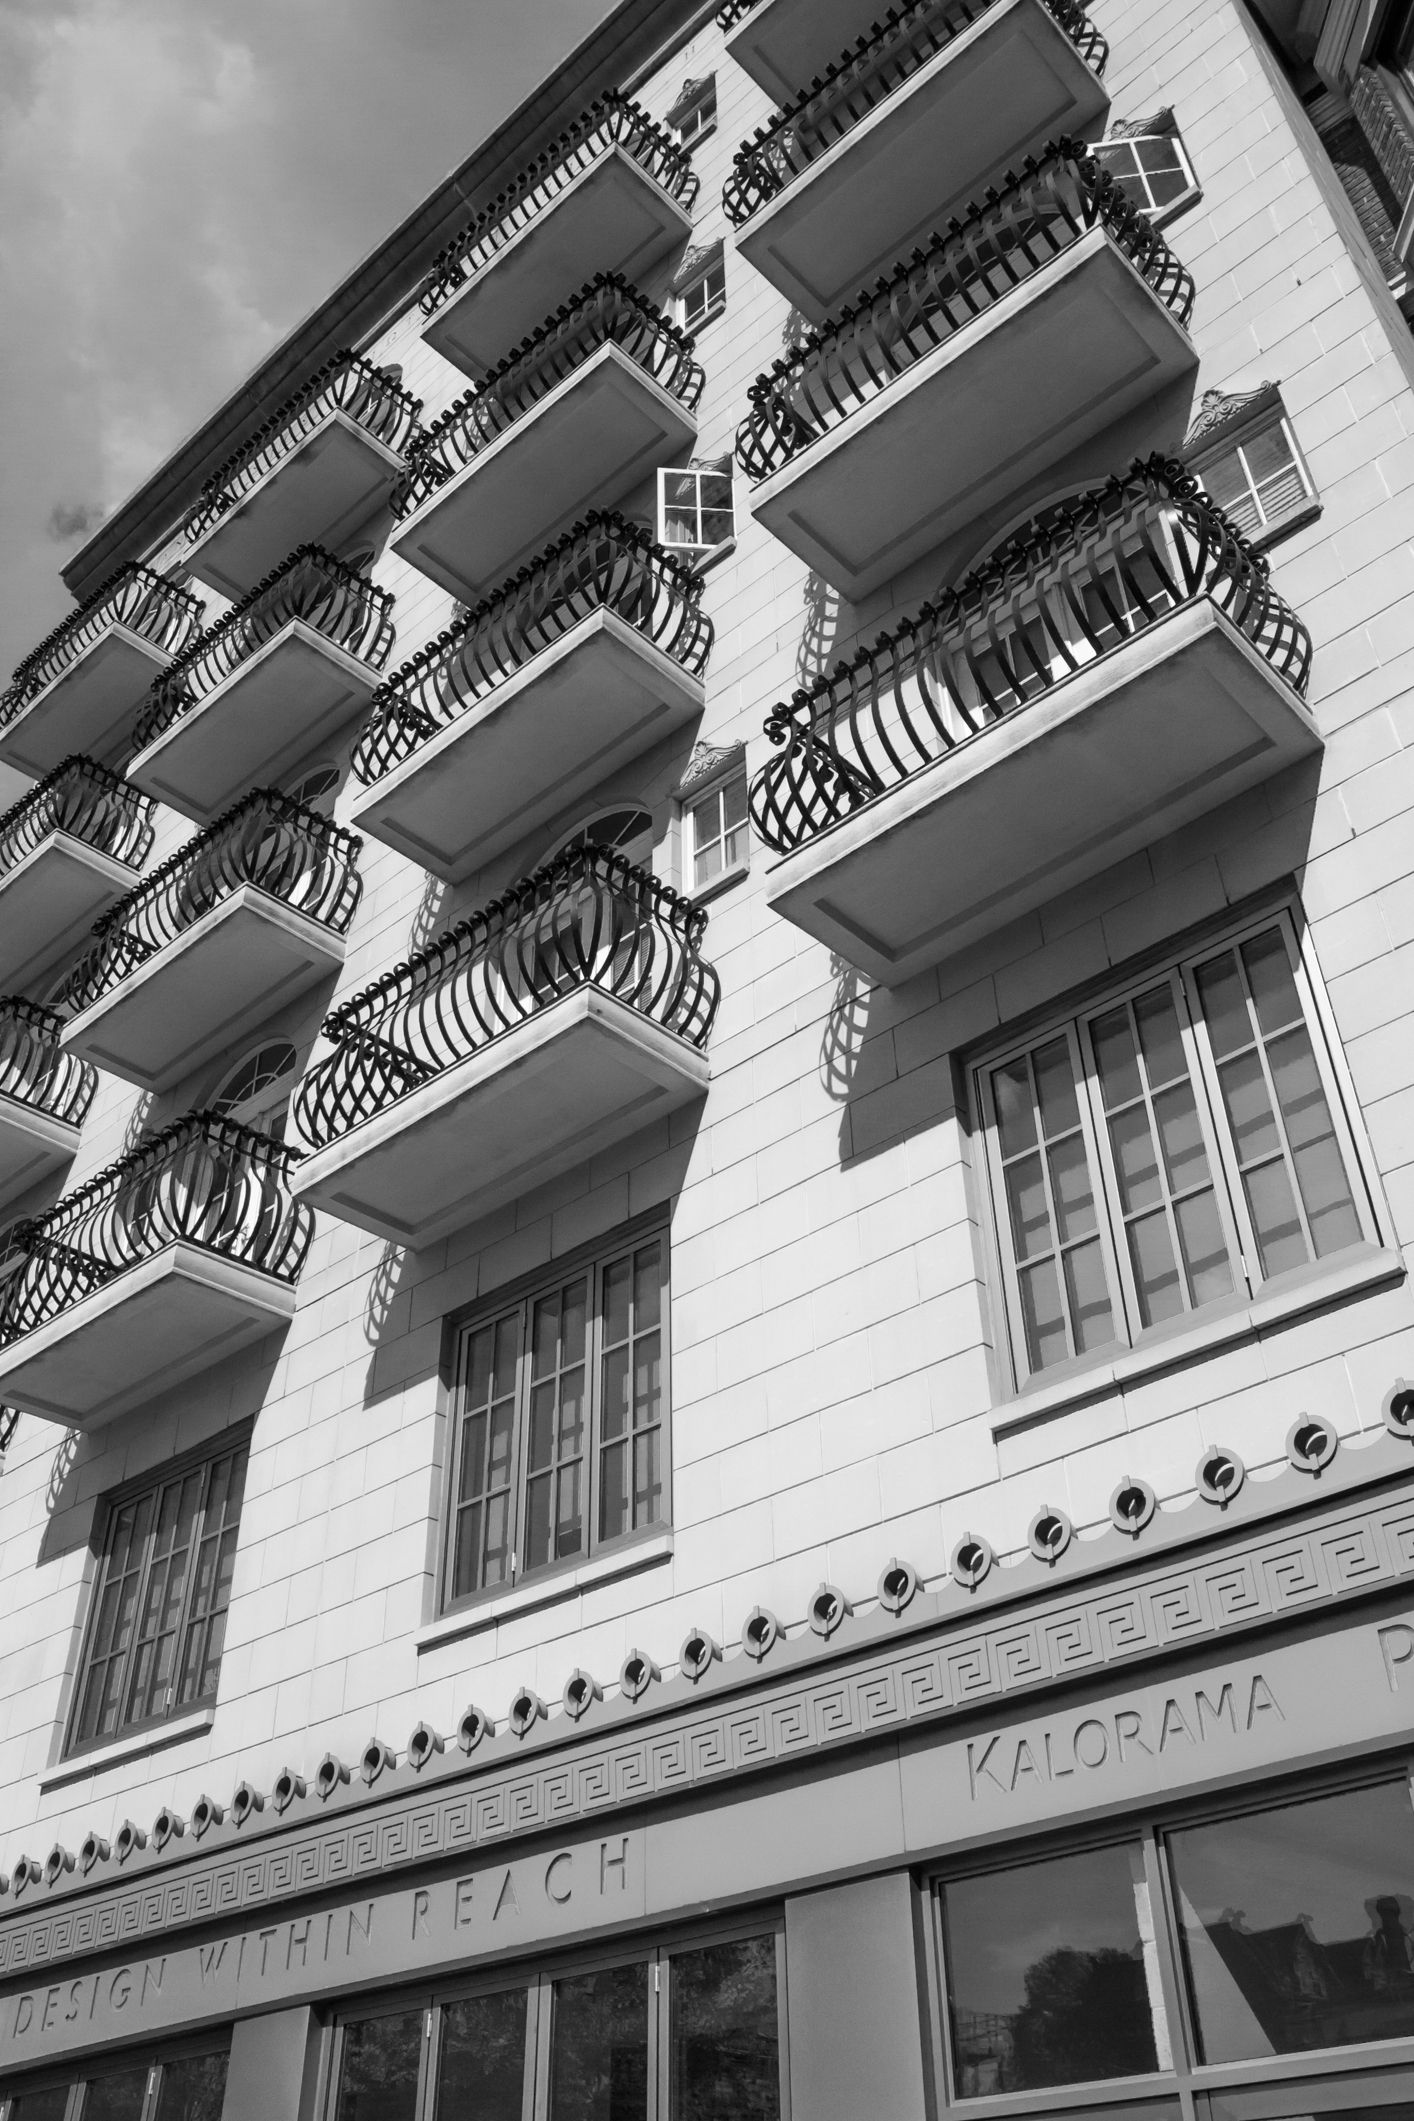 Balconies show off on a Kalorama building in Washington DC Not So SAHM